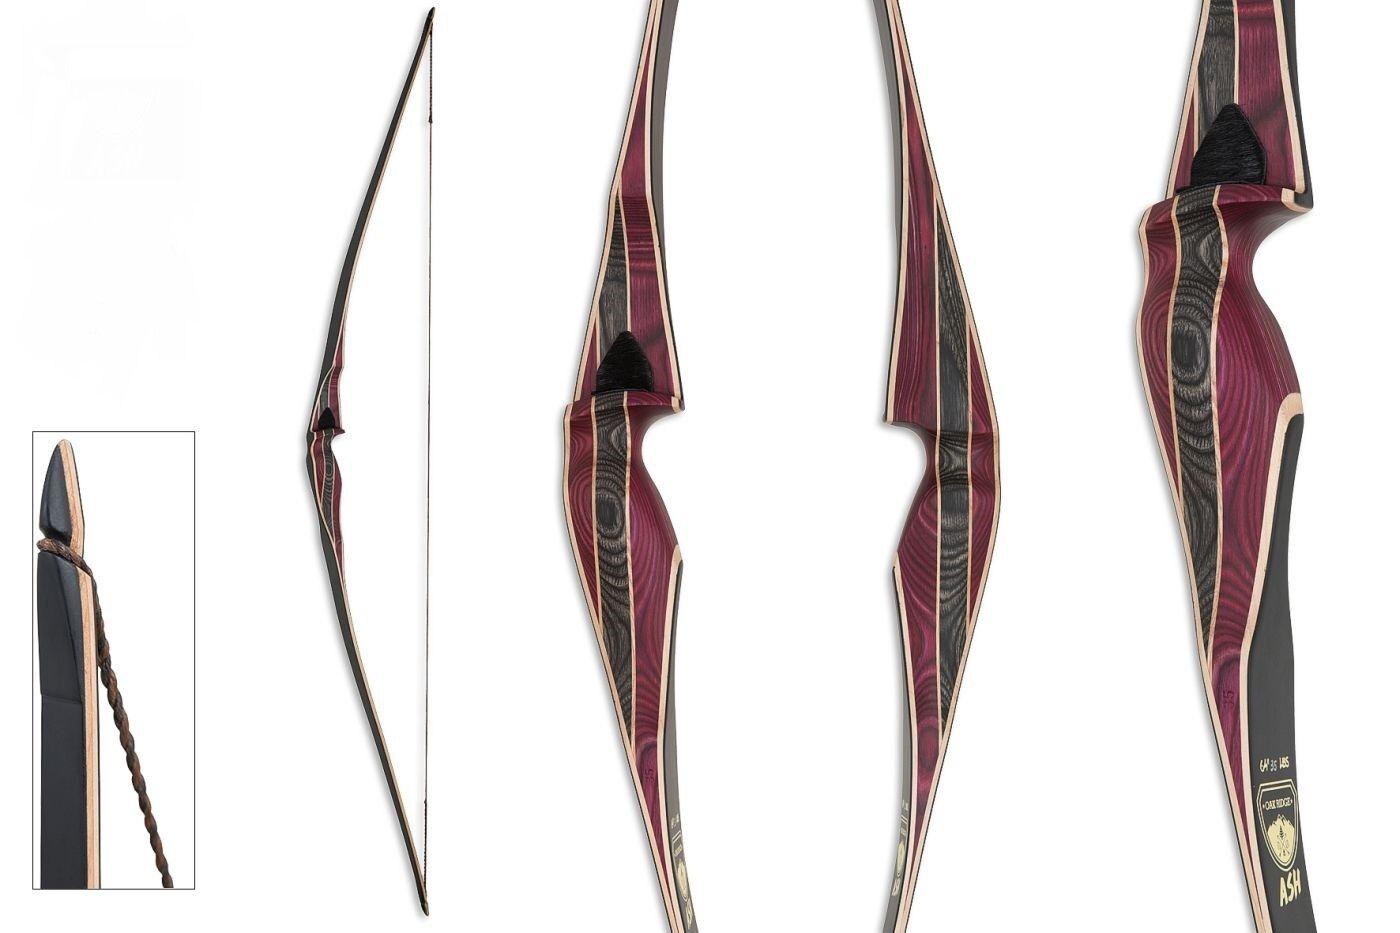 Longbow Traditional Bow oakt Ridge Ash 30, 35, 40 lbs Right Hand